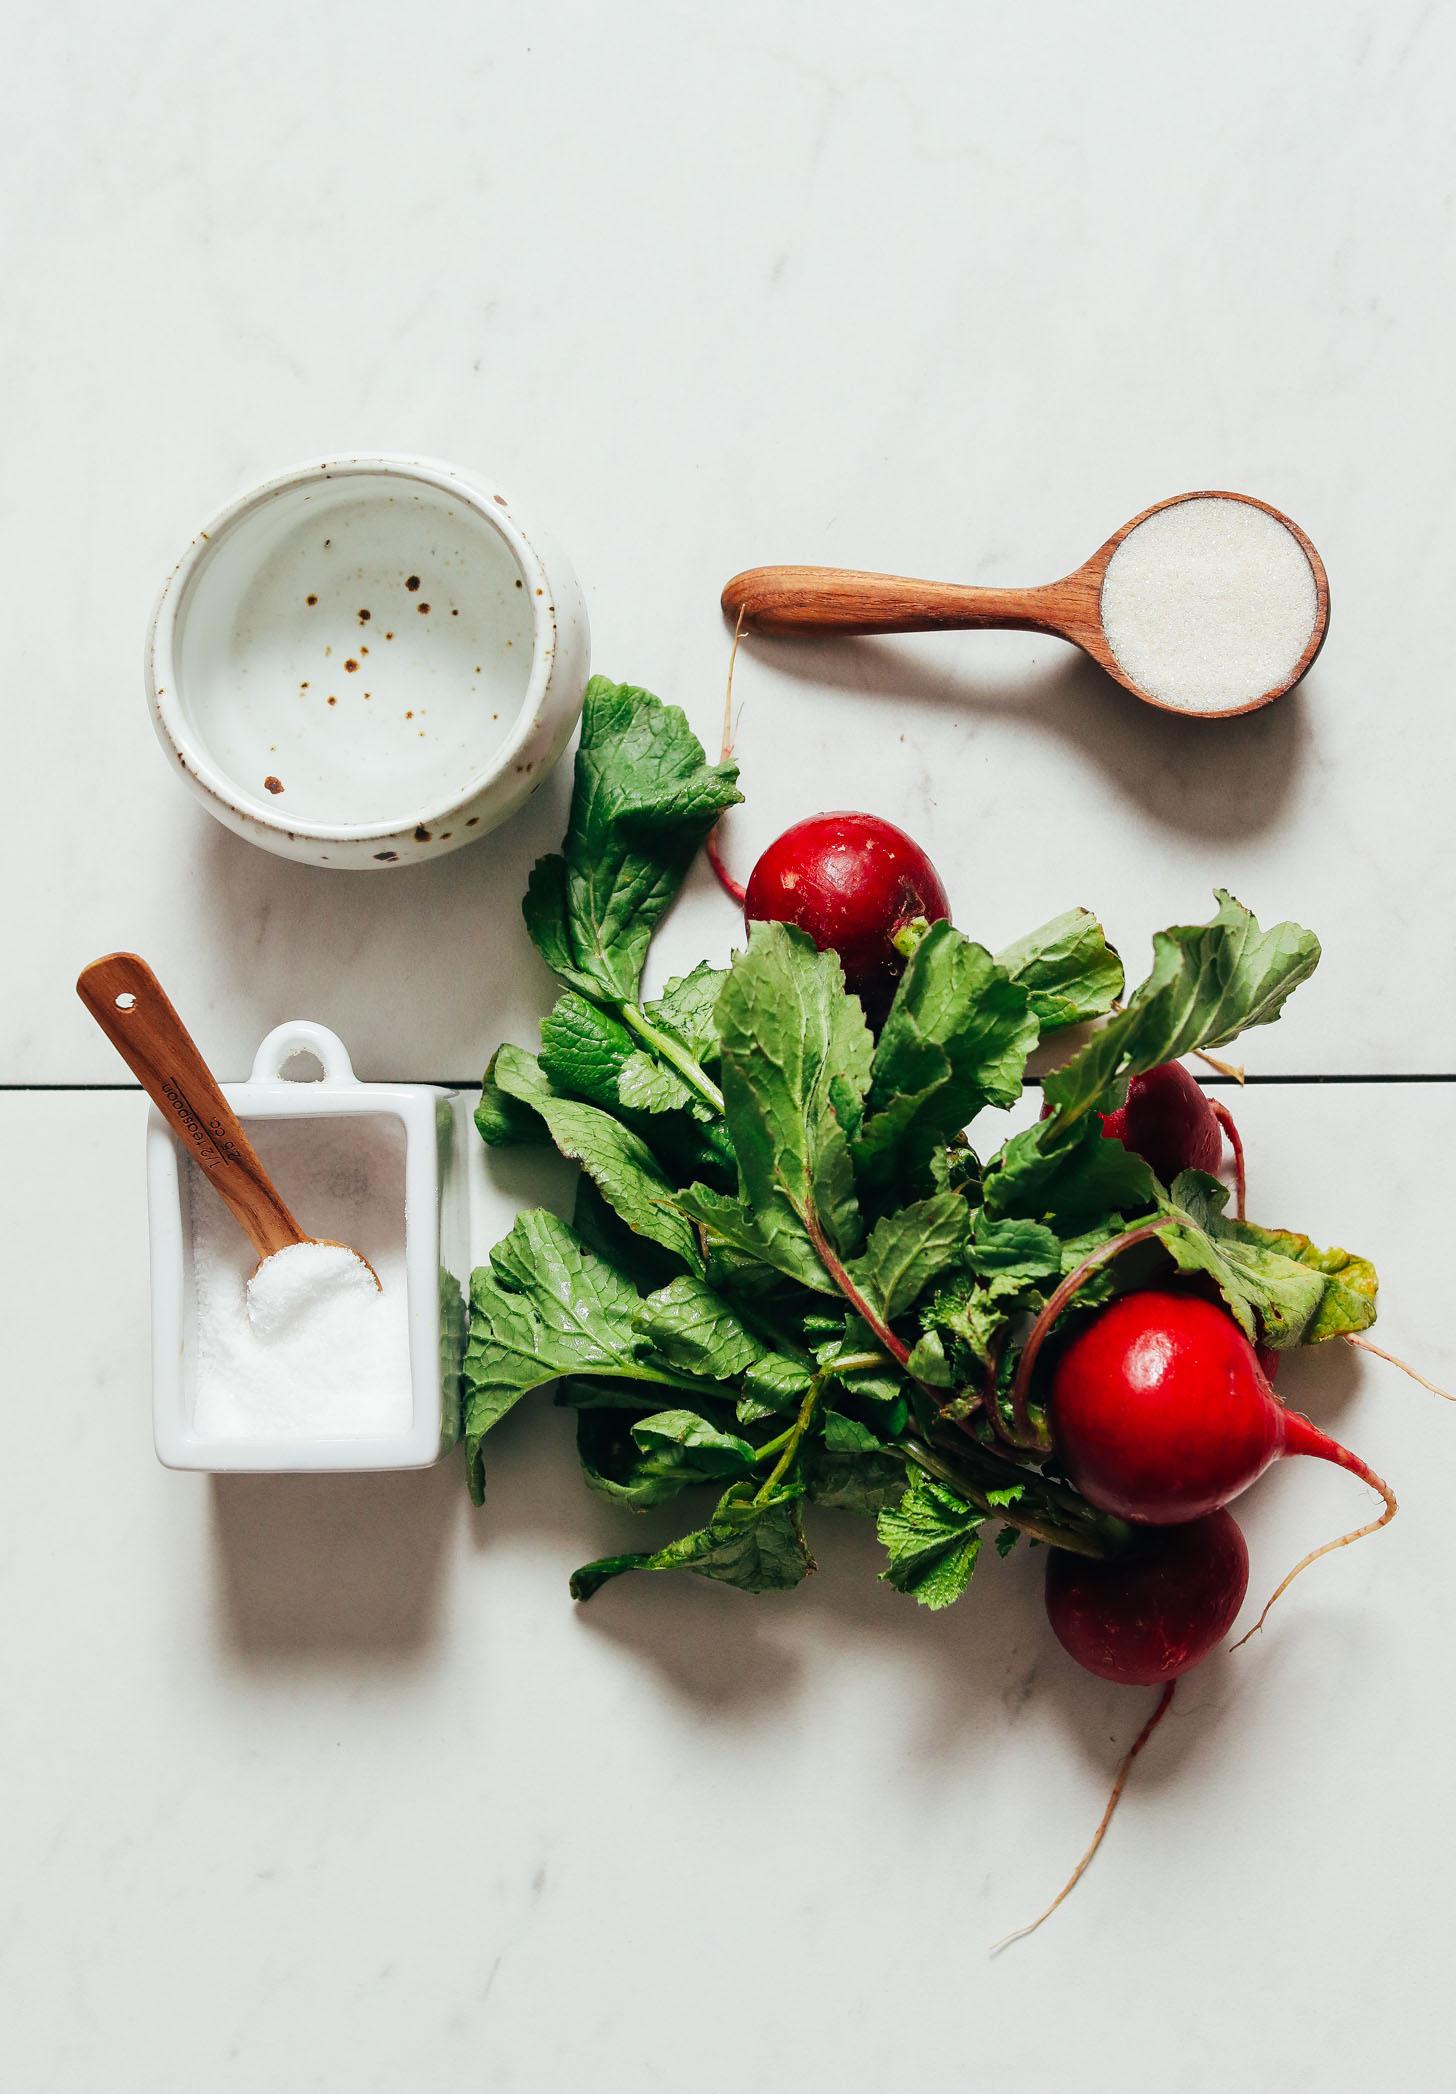 Fresh radish, sugar, salt, and vinegar for making Quick Pickled Radishes